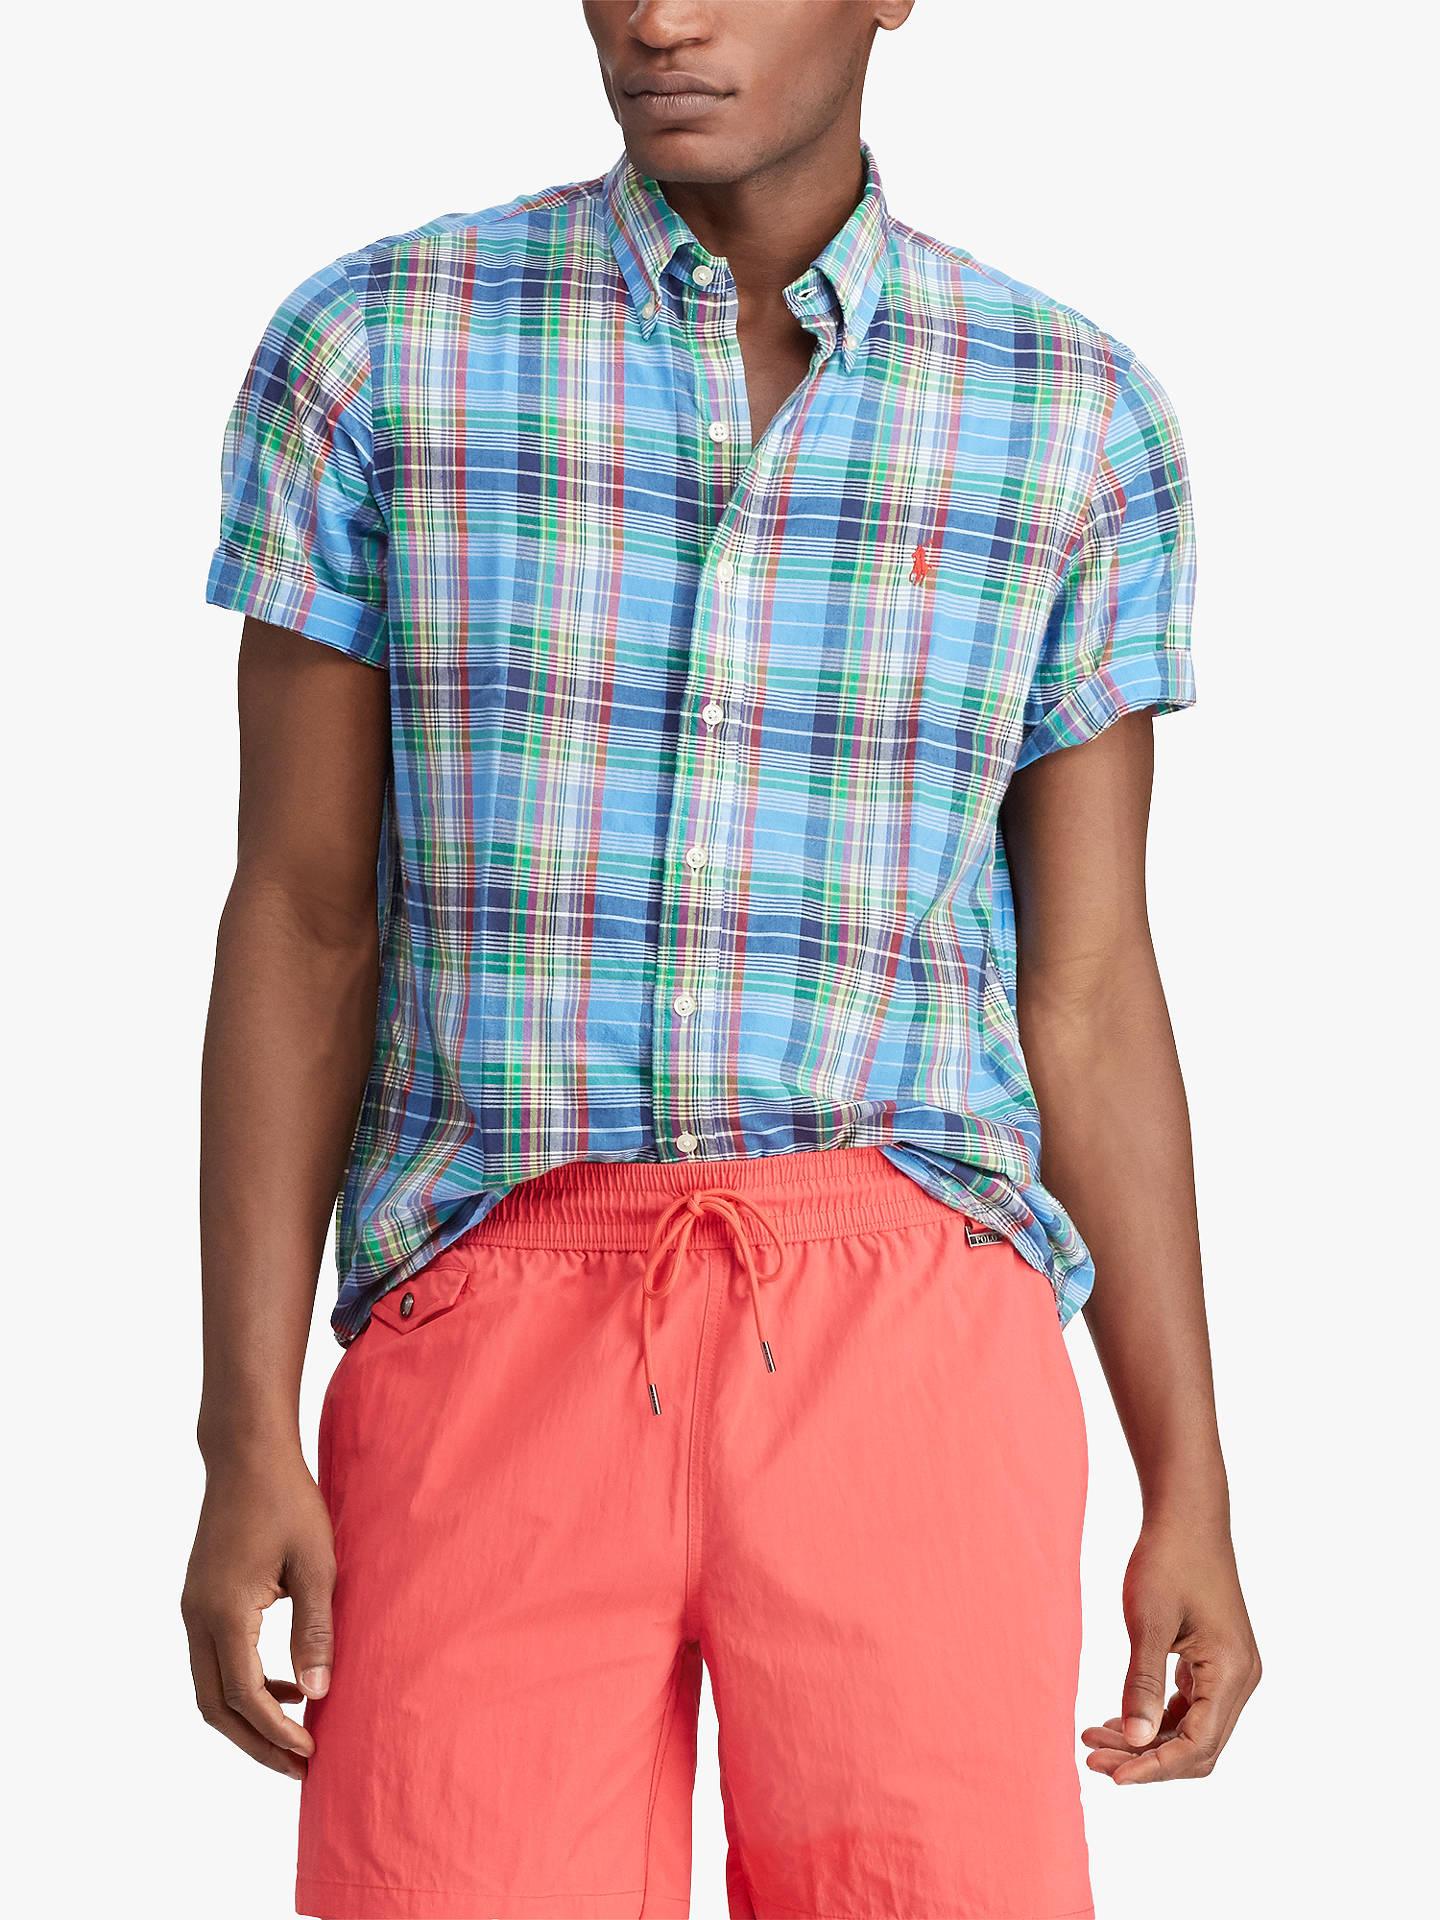 8170de55205a Polo Ralph Lauren Classic Fit Madras Shirt at John Lewis   Partners